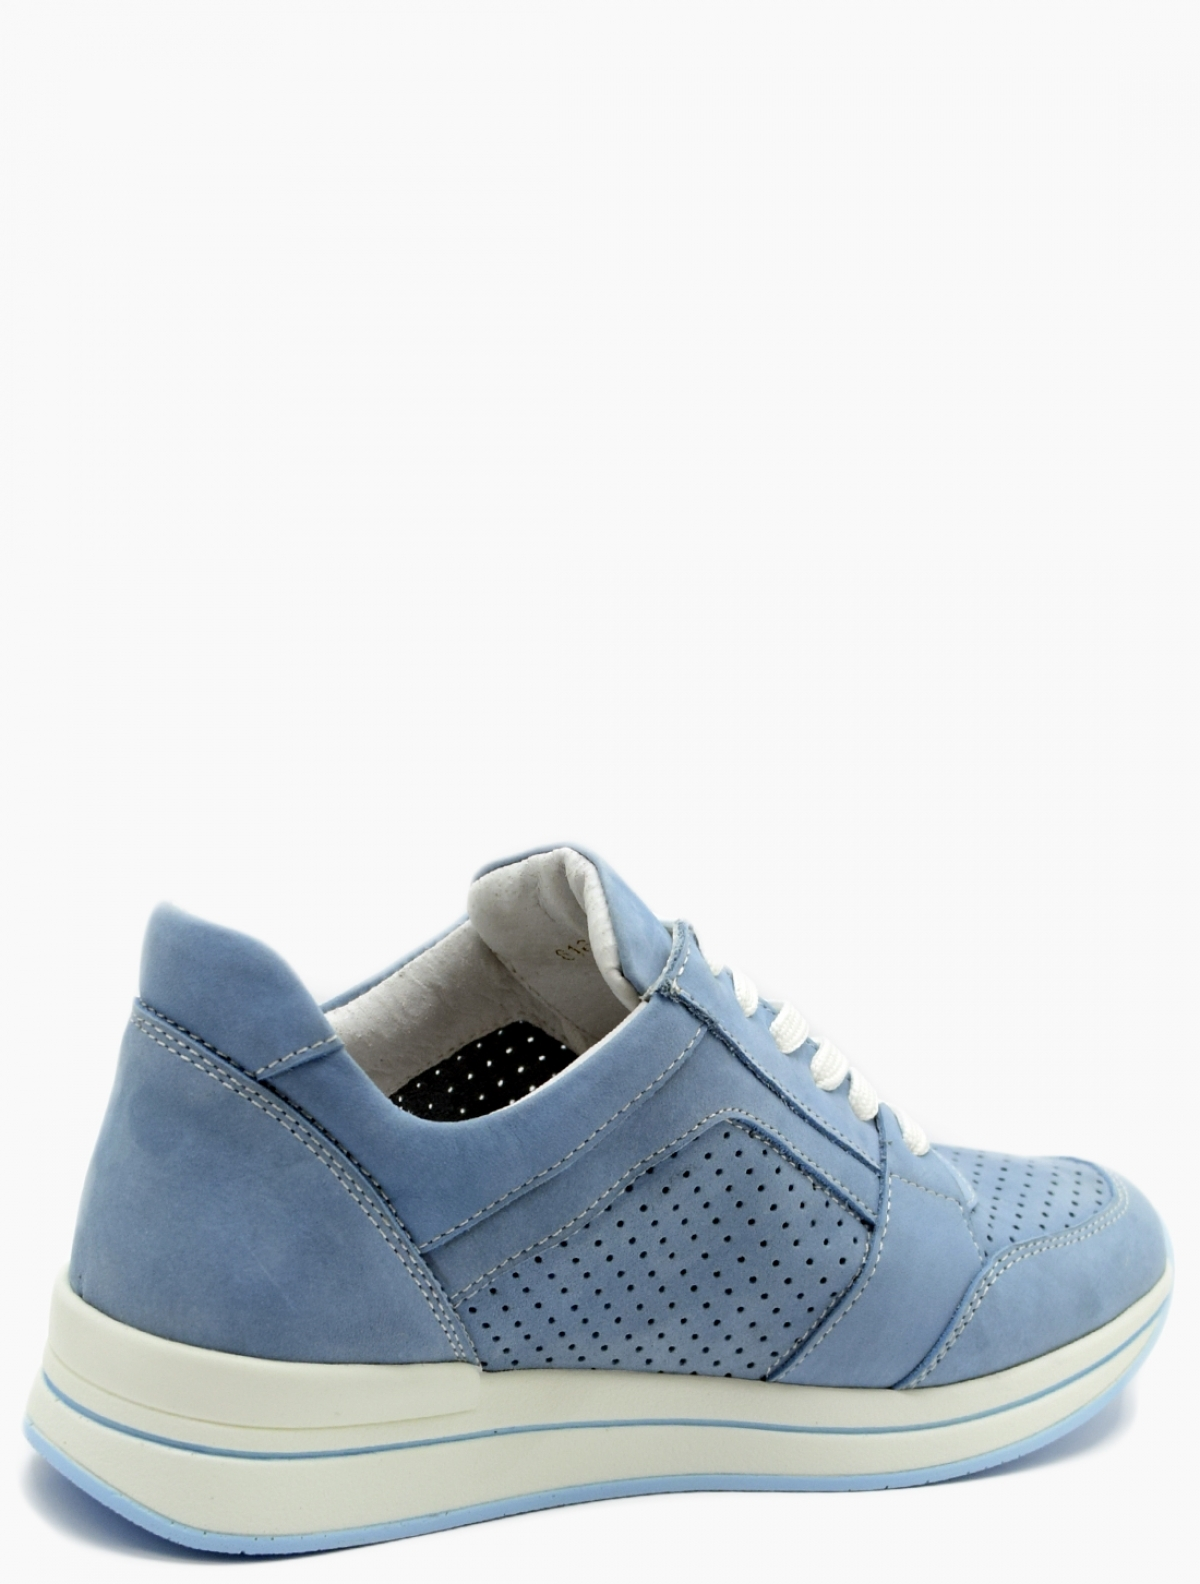 Dino Ricci trend 616-25-01 женские кроссовки